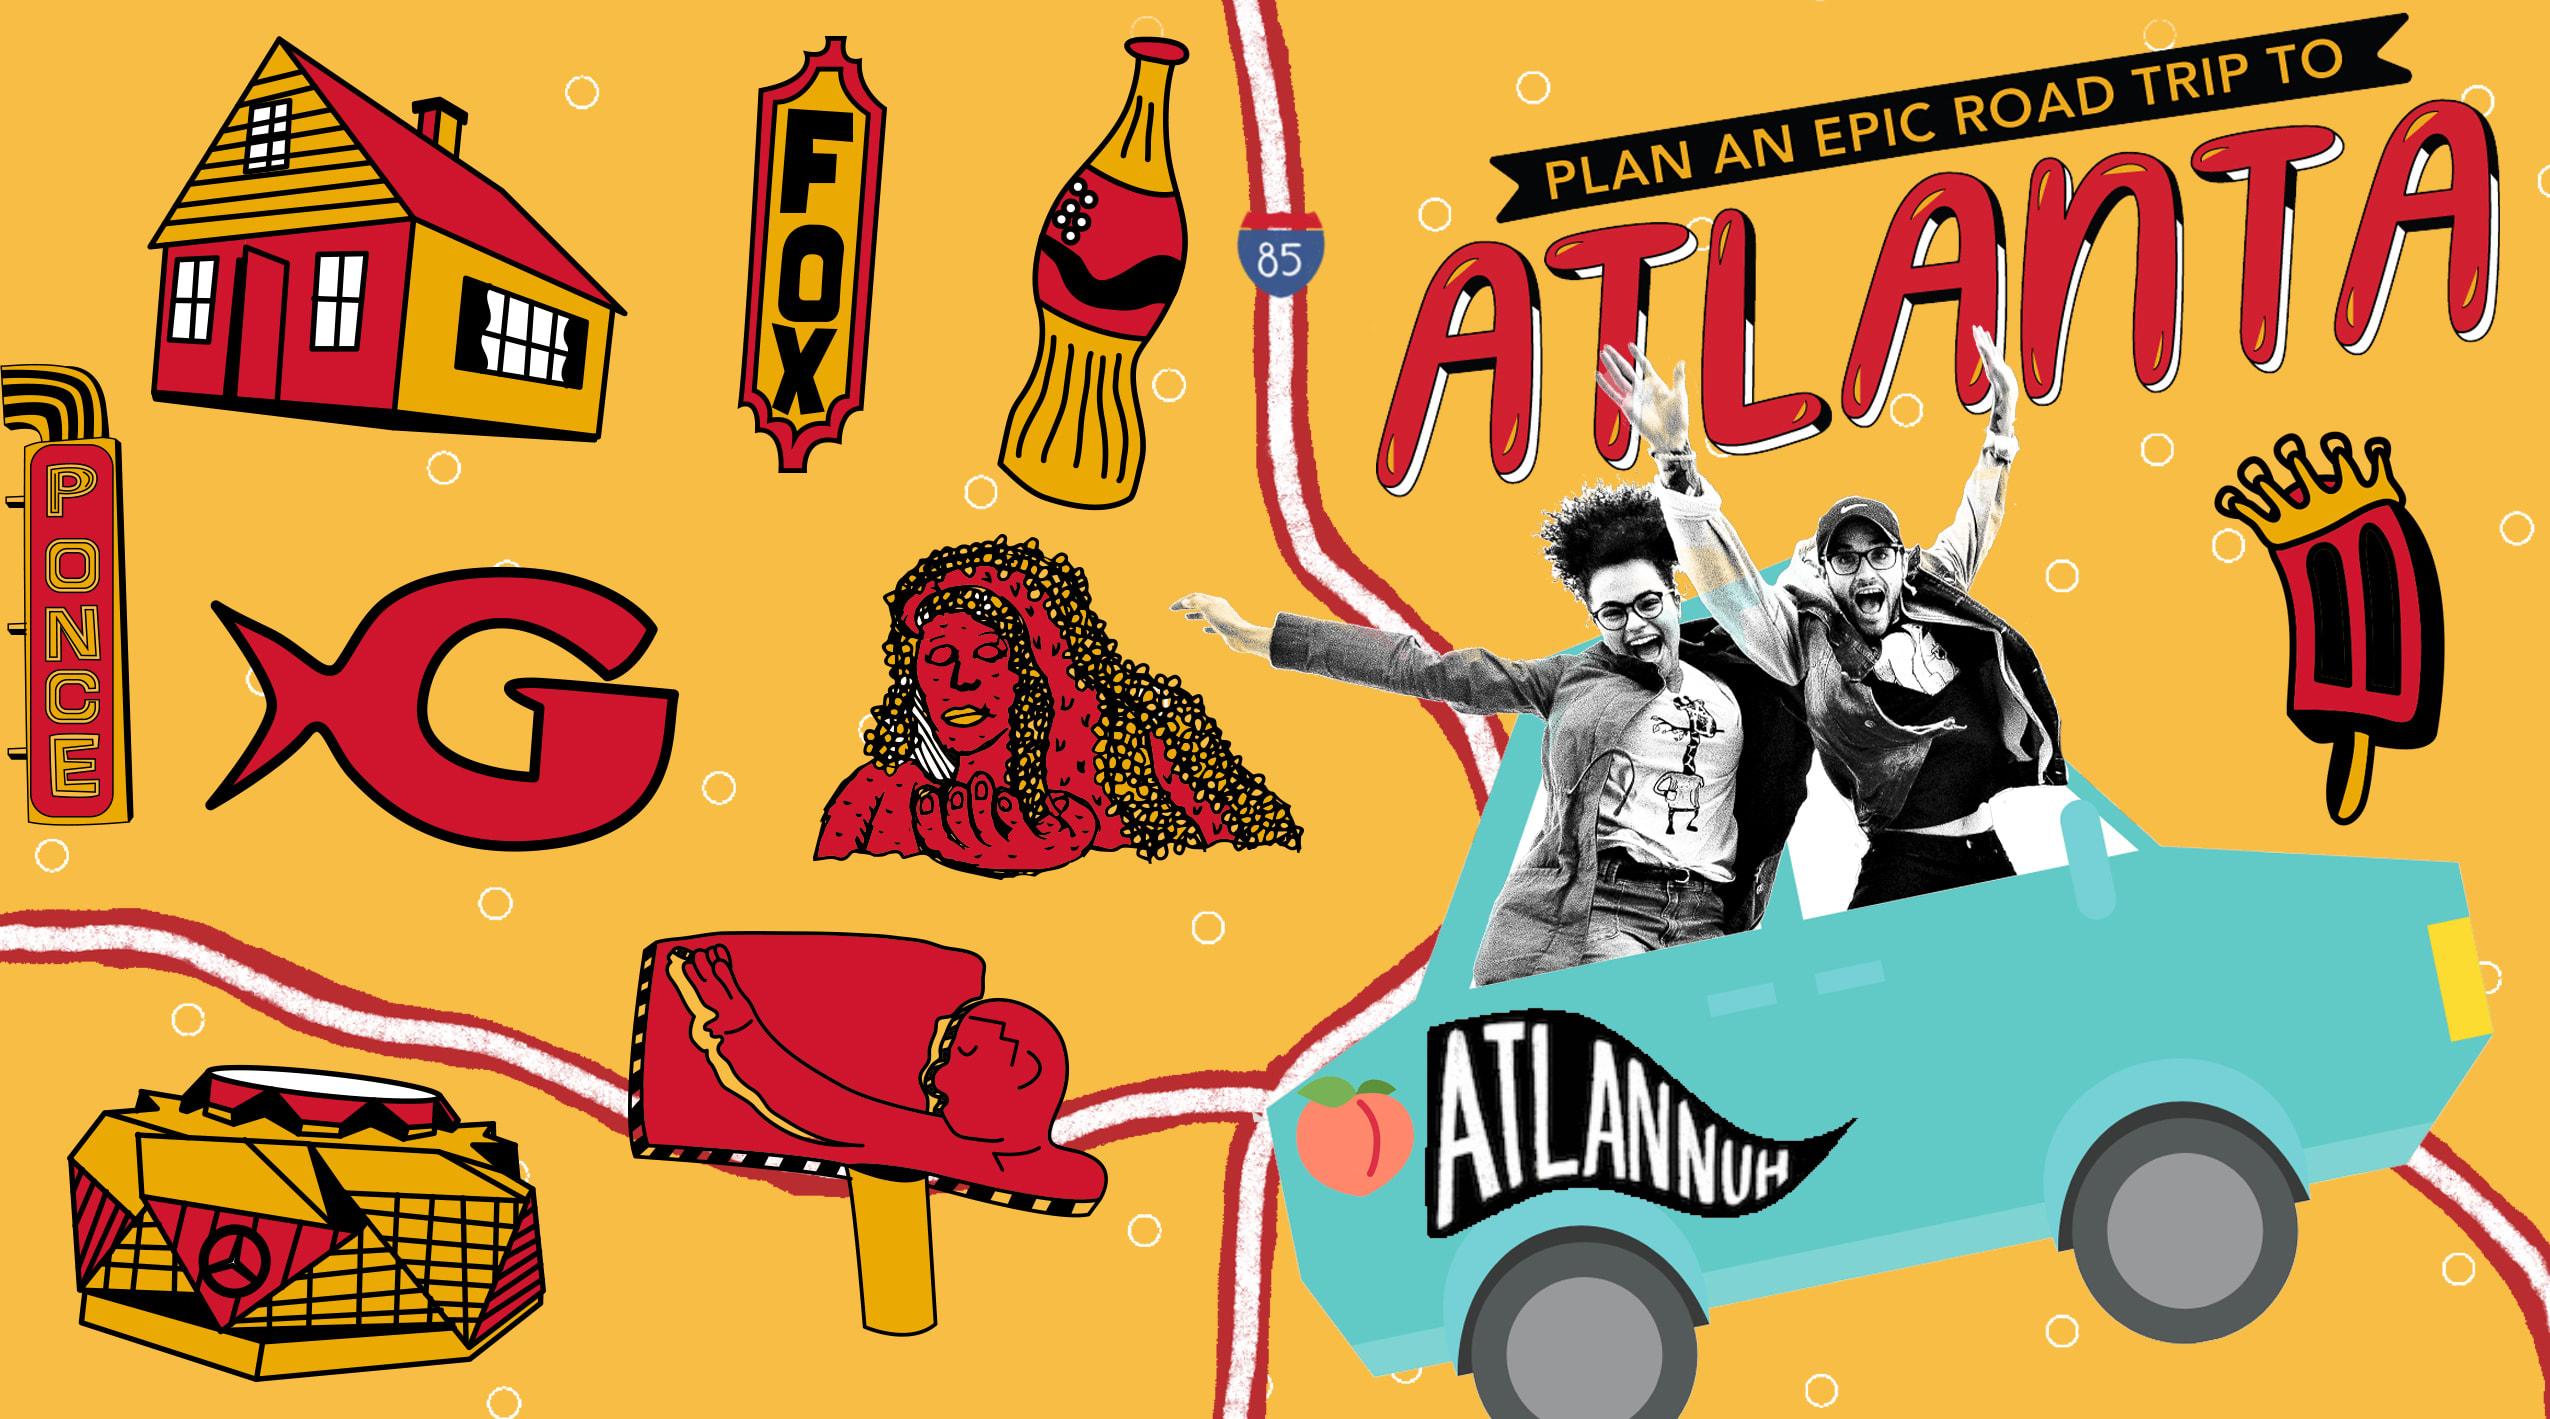 Roadtrip to Atlanta Graphic